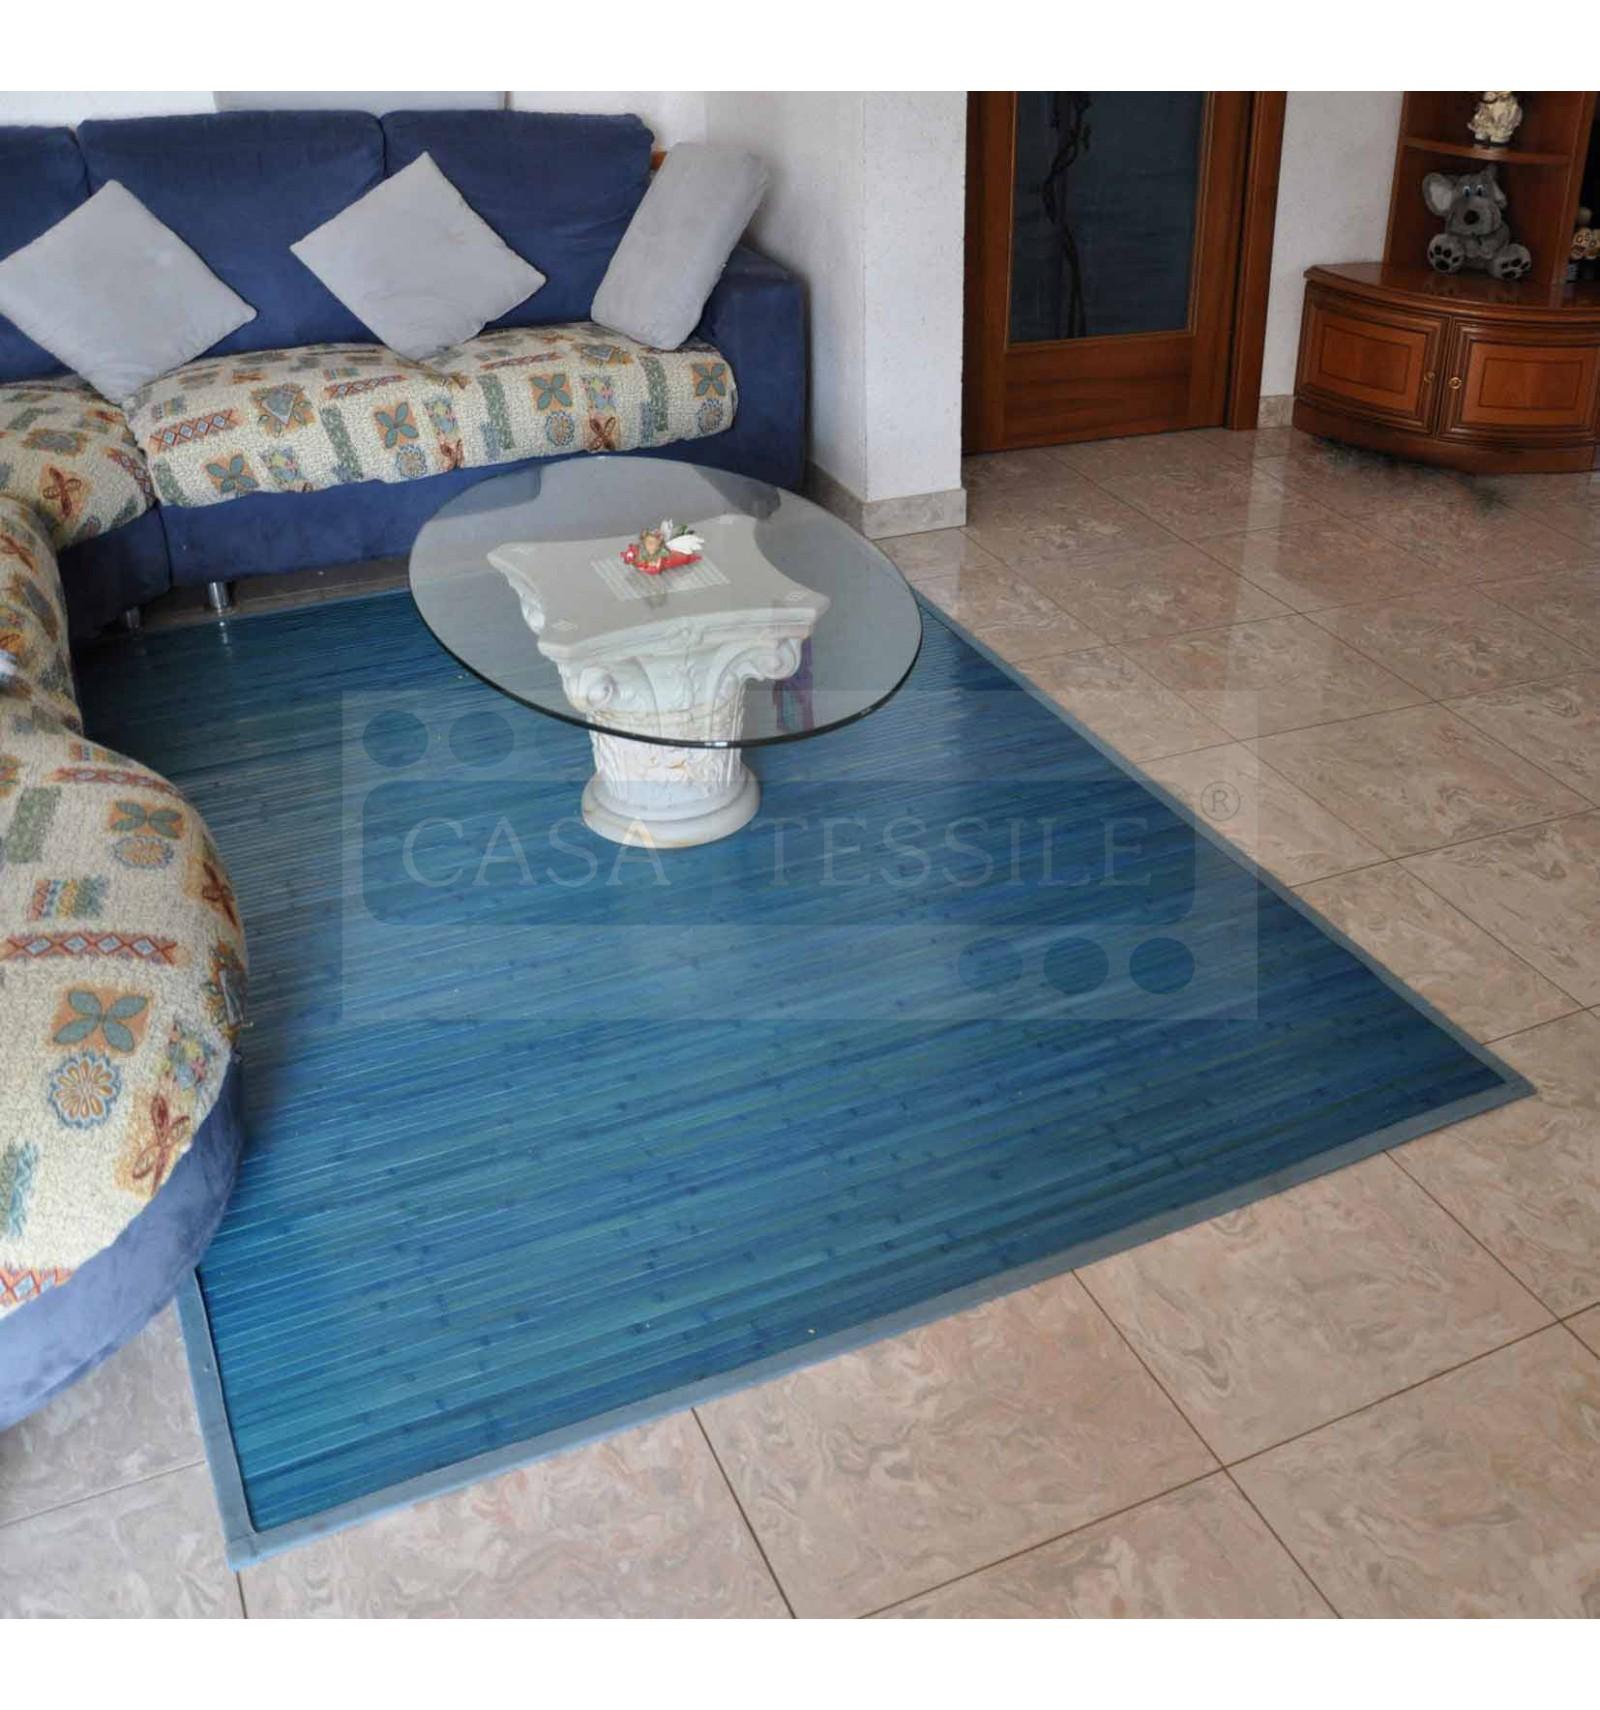 Bamb liscio tappeto passatoia cm 160x230 casa tessile - Tappeto 160x230 ...